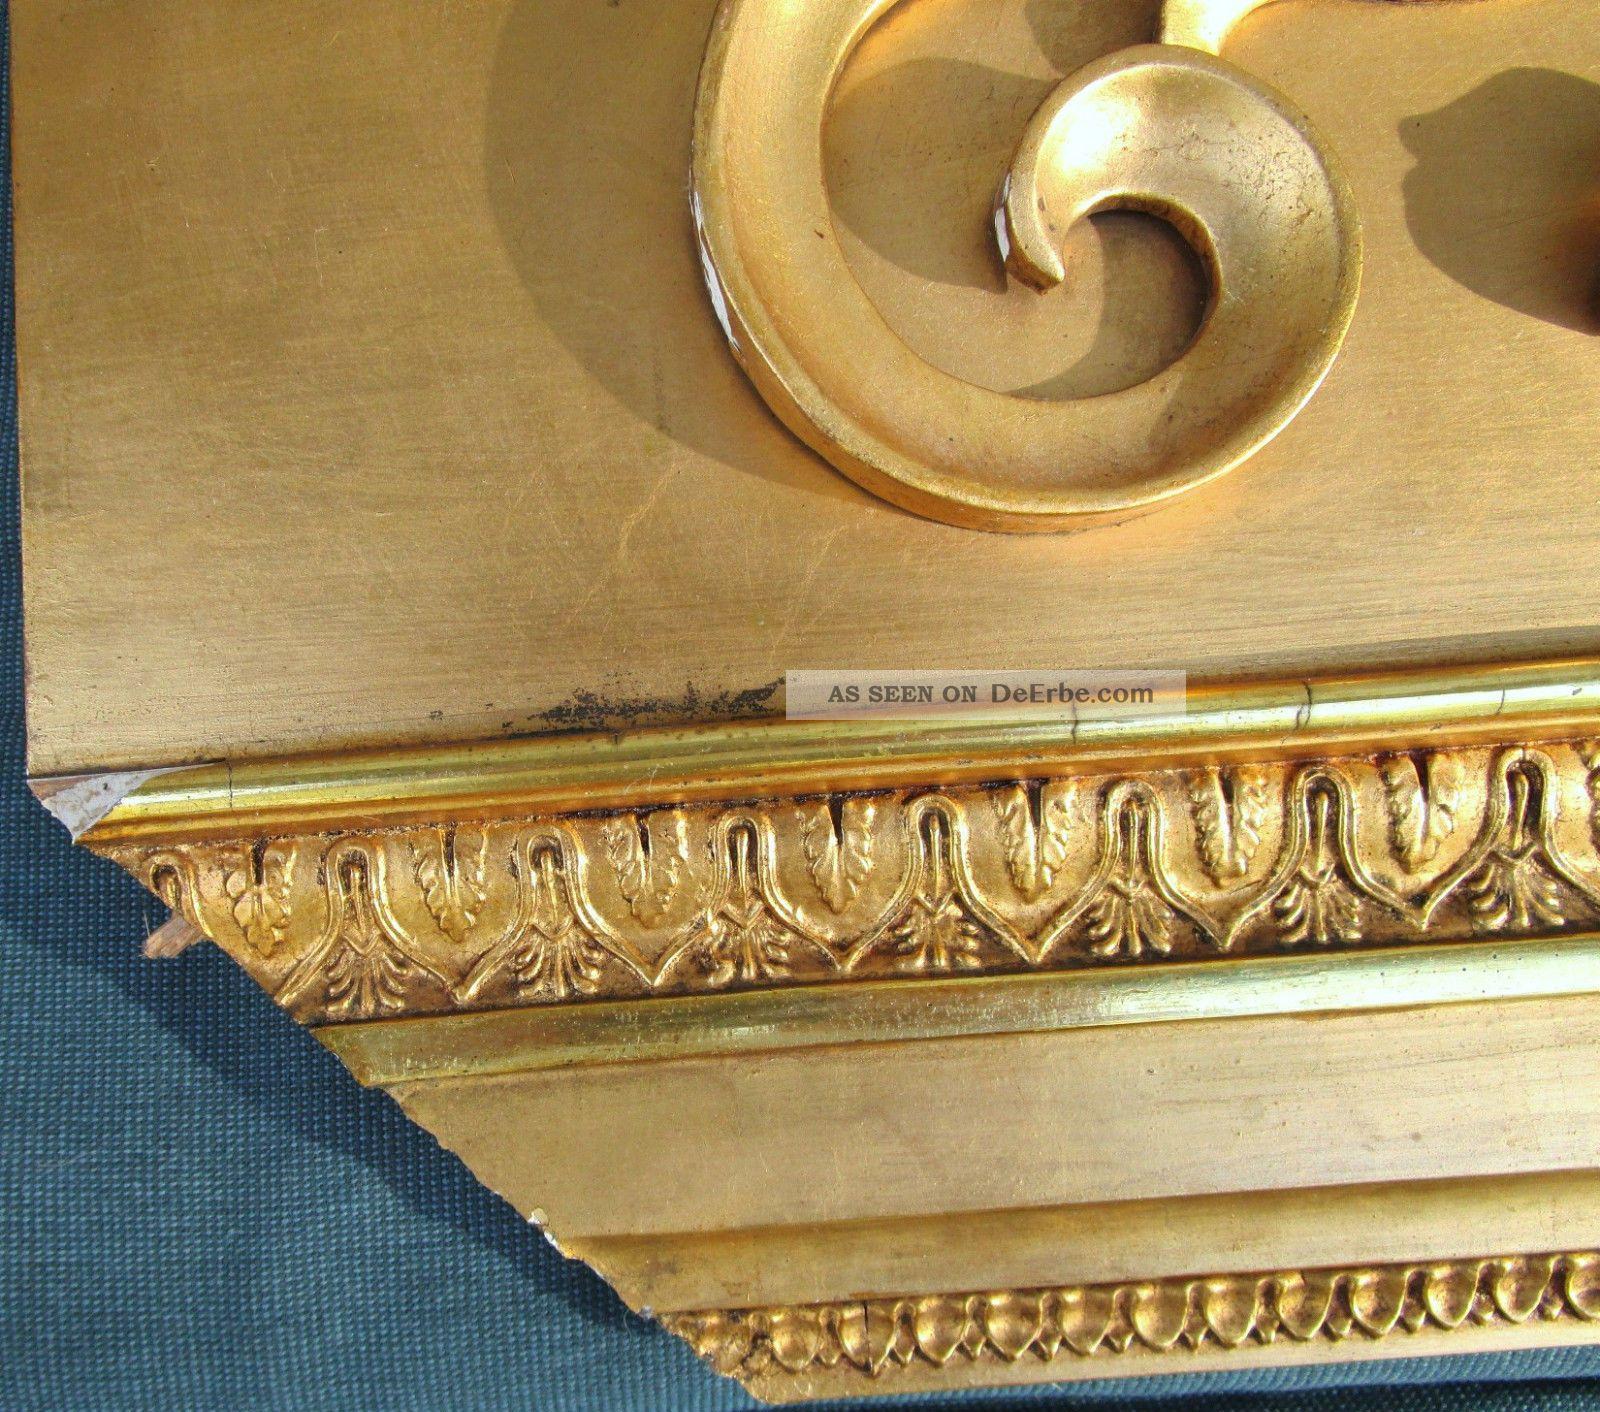 supraporte t raufsatz wanddekoration holz 67 x 43 cm vergoldet. Black Bedroom Furniture Sets. Home Design Ideas